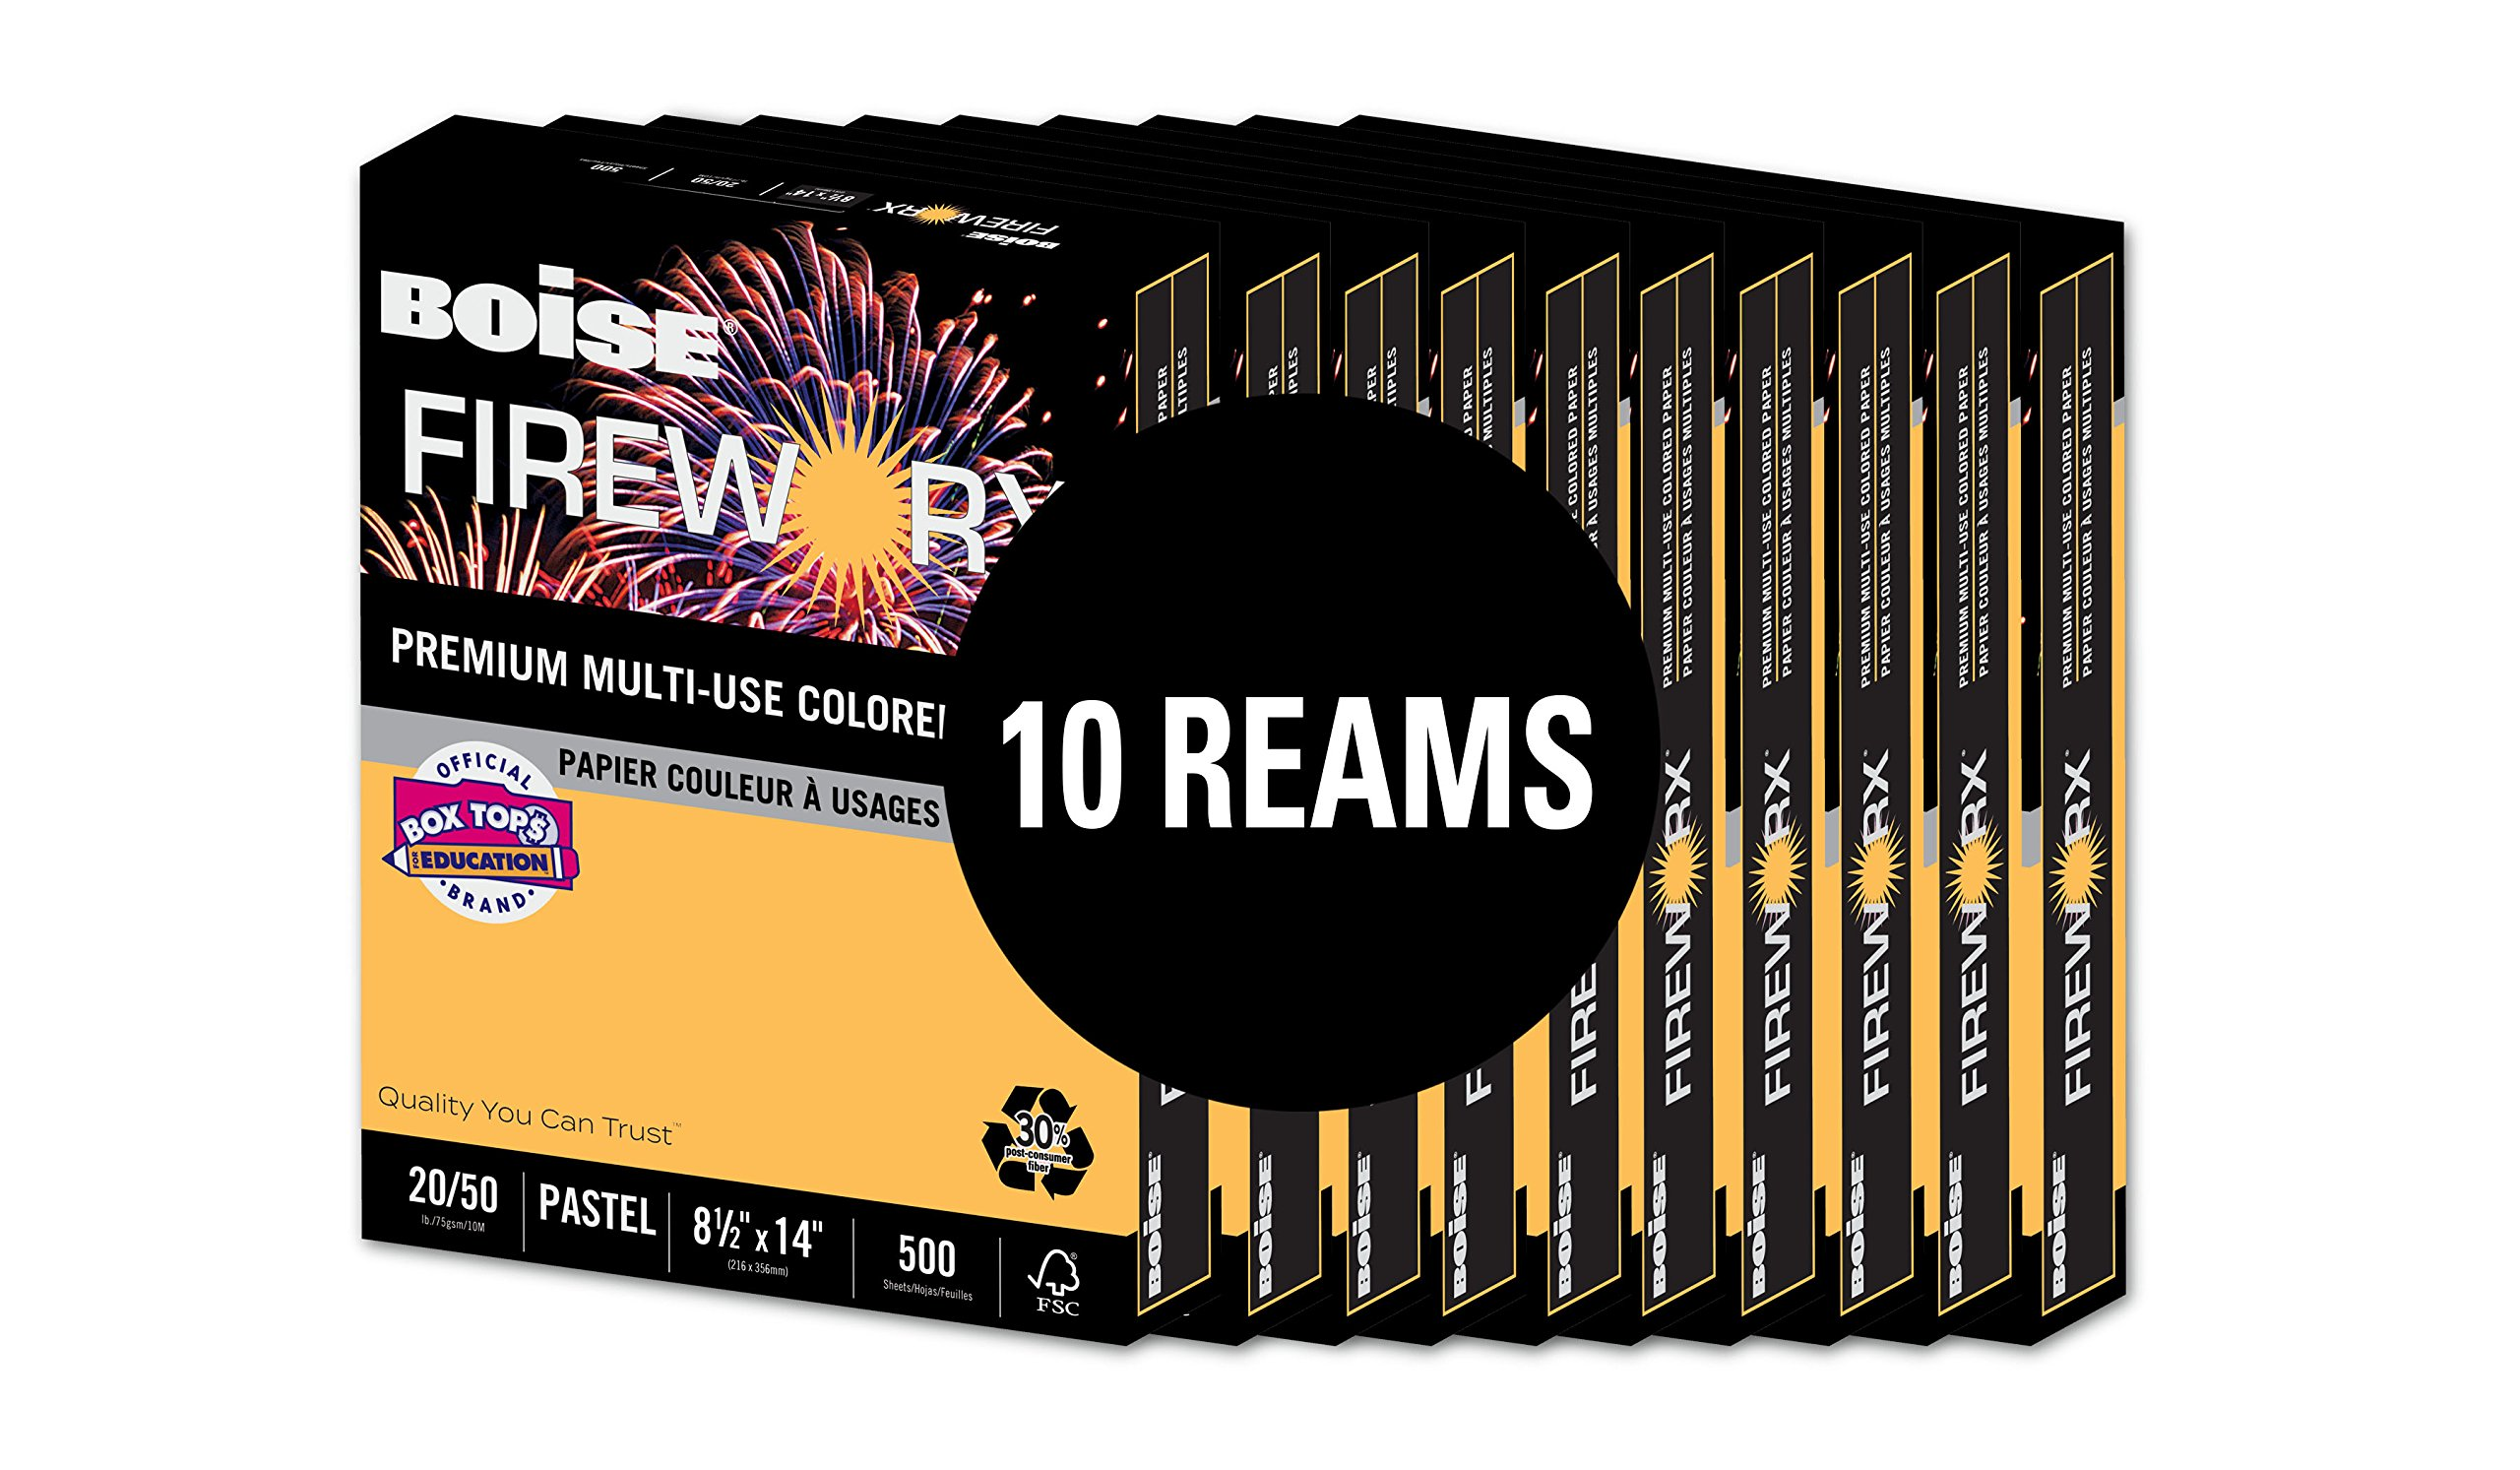 BOISE FIREWORX Premium Multi-Use Colored Paper, 8.5 x 14, Golden Glimmer, 20 lb, 10 ream carton (5,000 Sheets) by Boise Paper (Image #2)